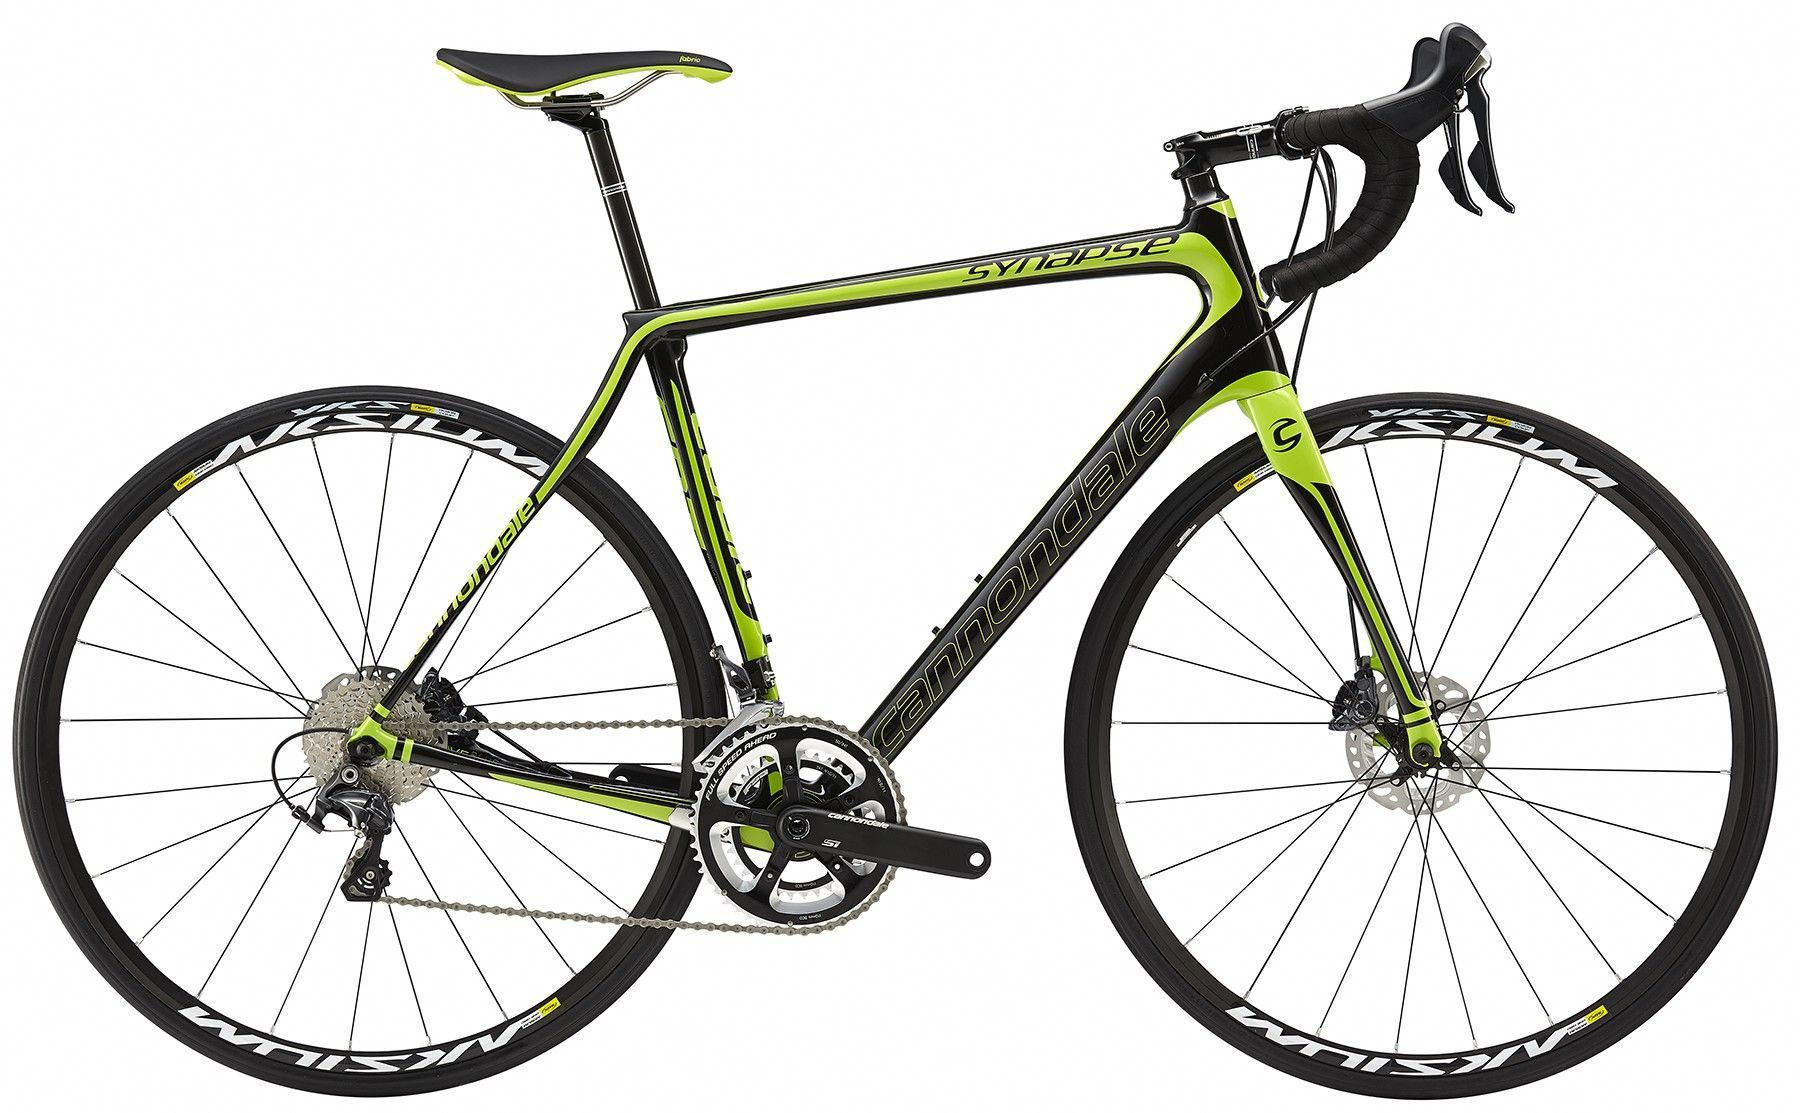 Synapse Carbon Ultegra Disc Synapse Carbon Endurance Road Road Bikes 2015 Roadbikeaccessories Cannondale Bikes Cannondale Cyclocross Bike